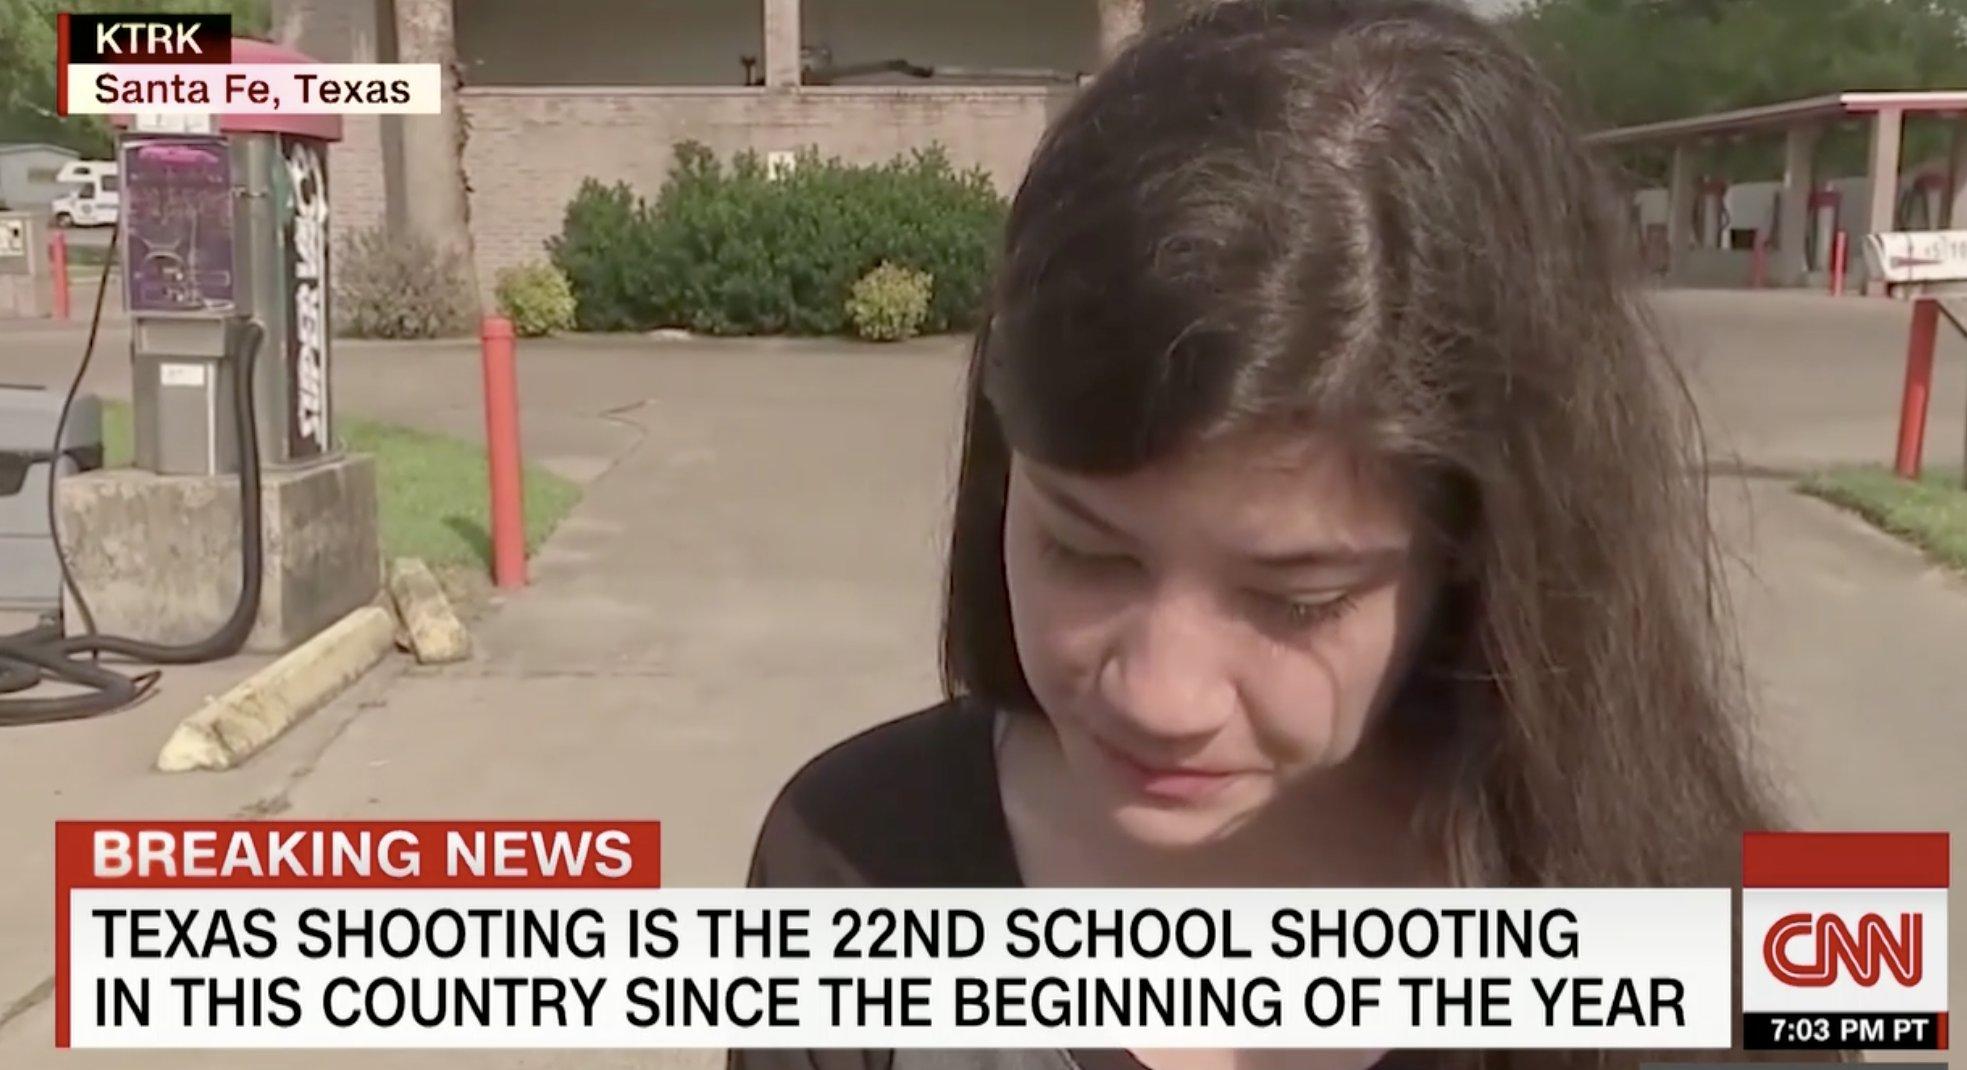 icymi: school shooting coverage challenges, 2018 update on newsroom